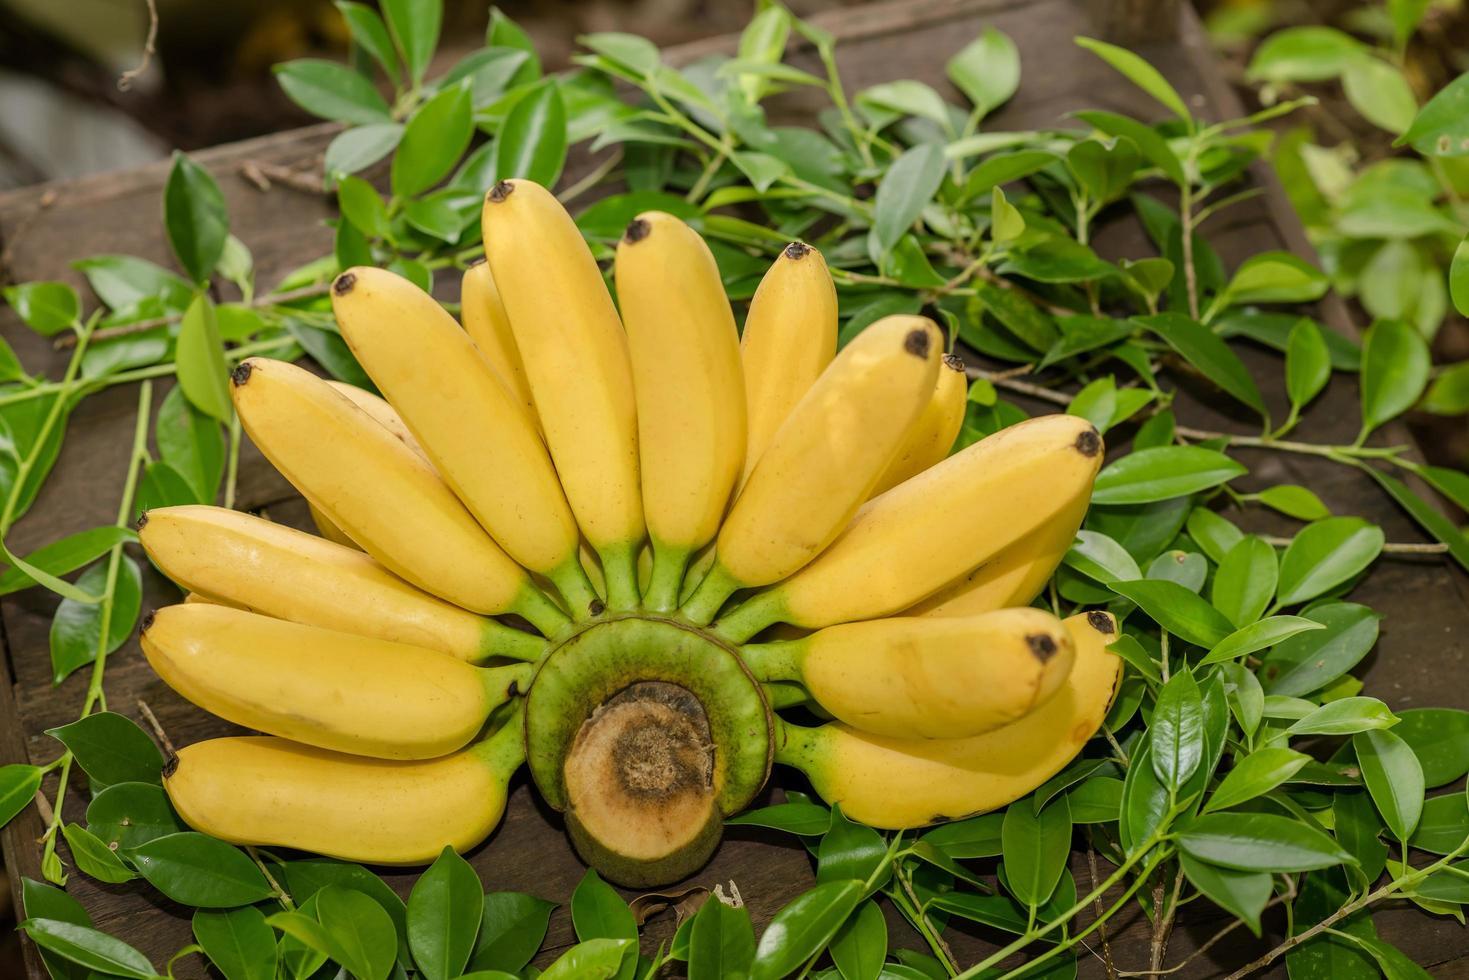 Fresh bananas on a table photo